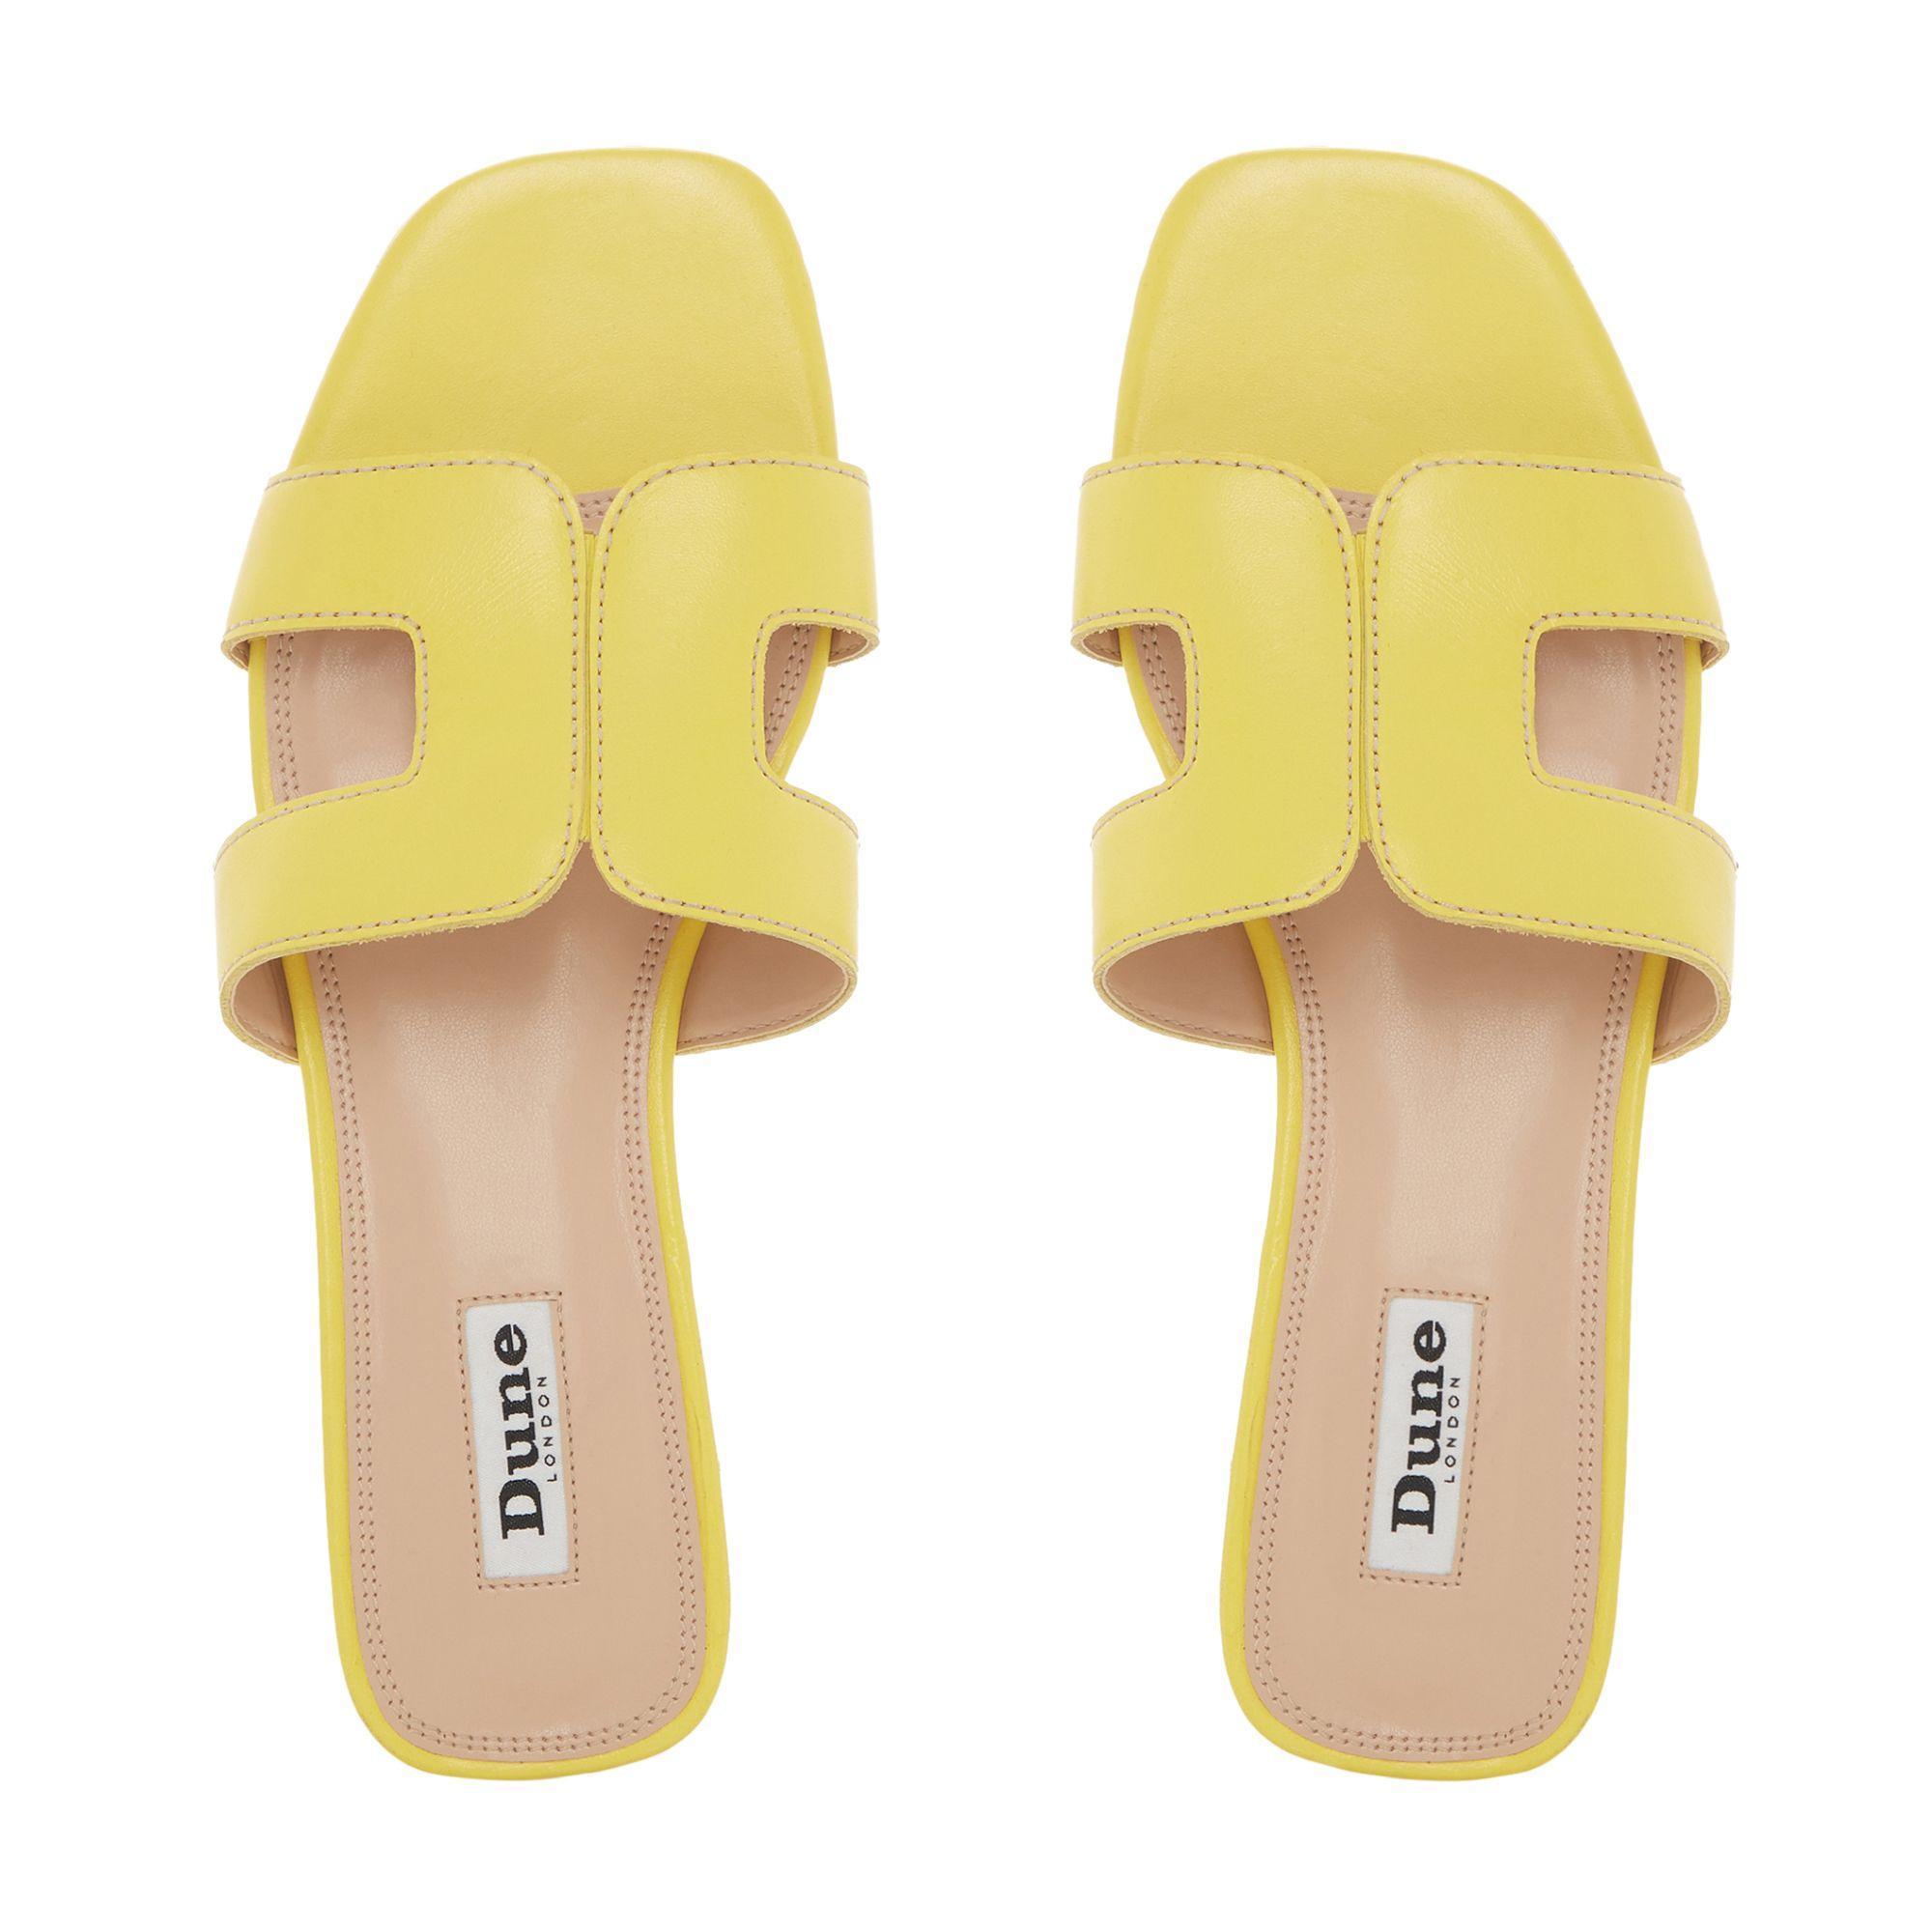 5c33e6d80 Dune - Yellow Leather  loupe  Block Heel Mule Sandals - Lyst. View  fullscreen